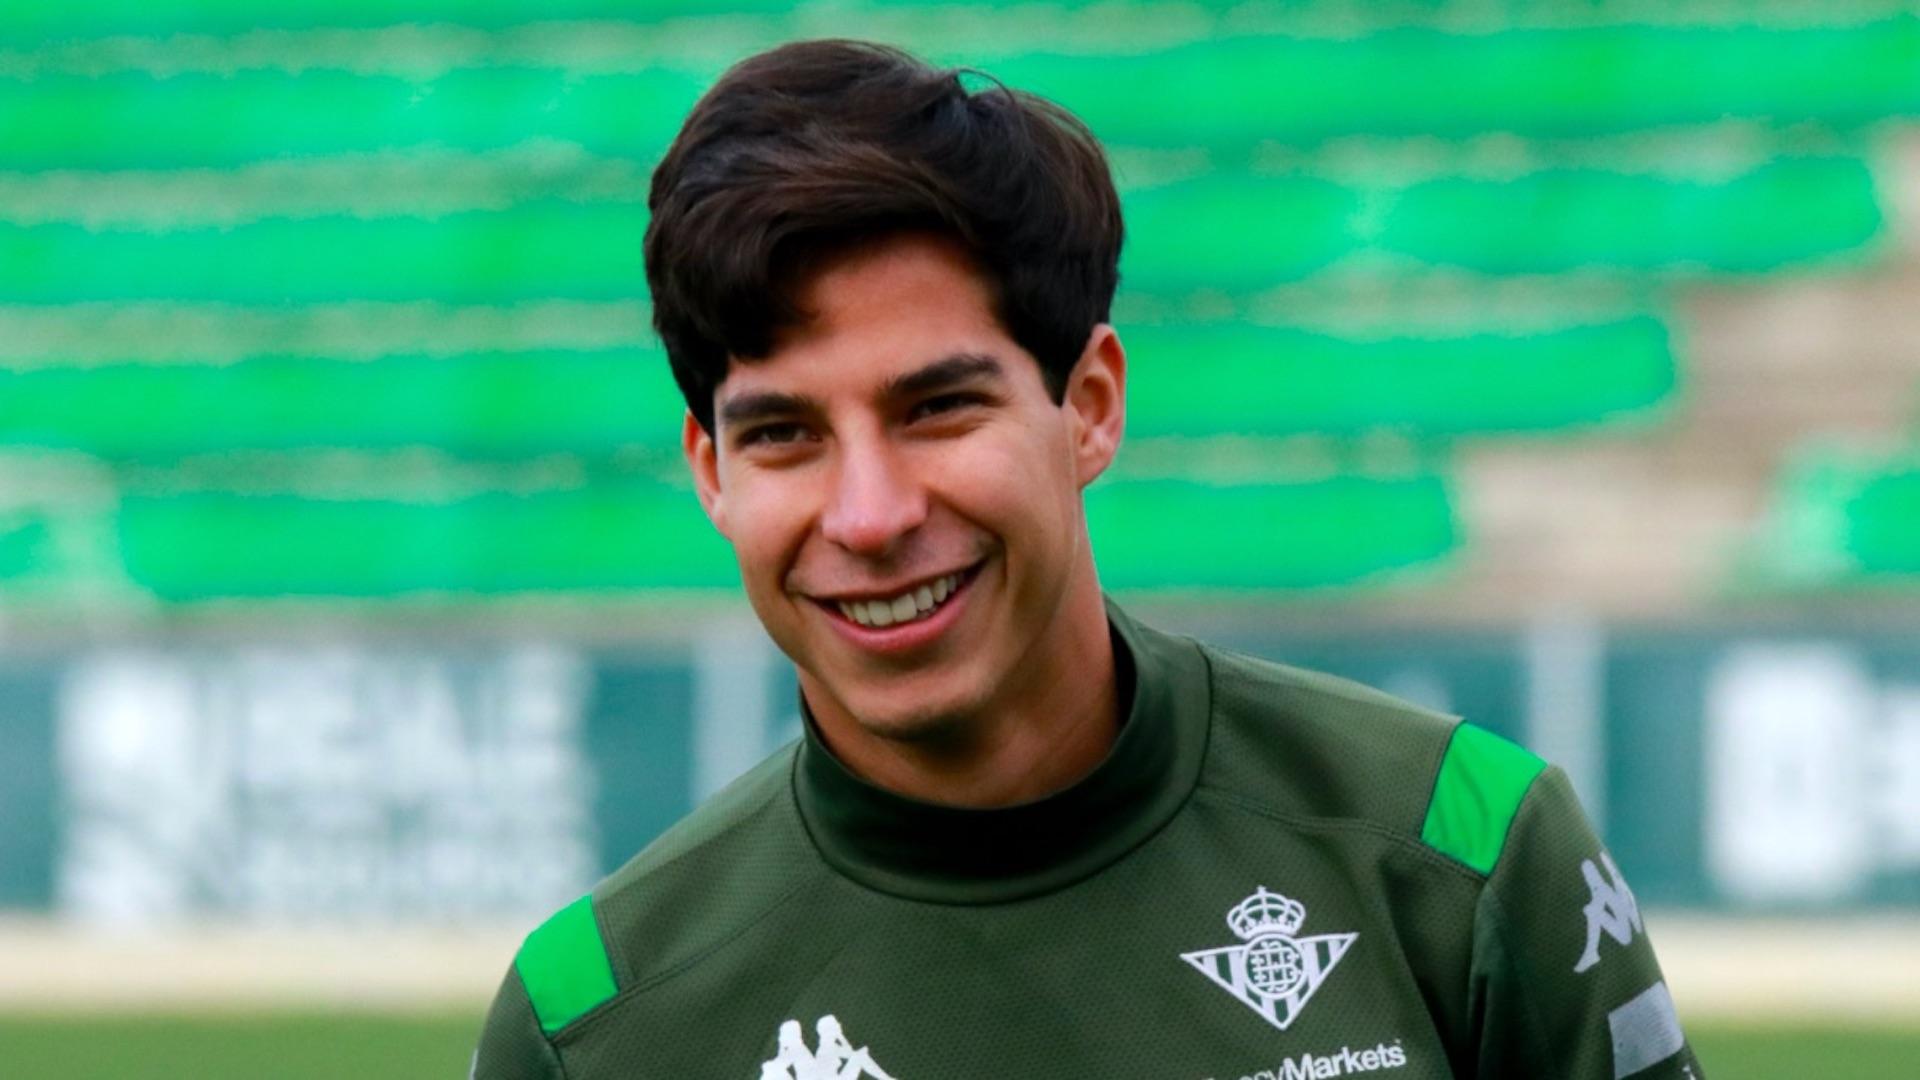 Diego Lainez confirma que es positivo por Covid-19